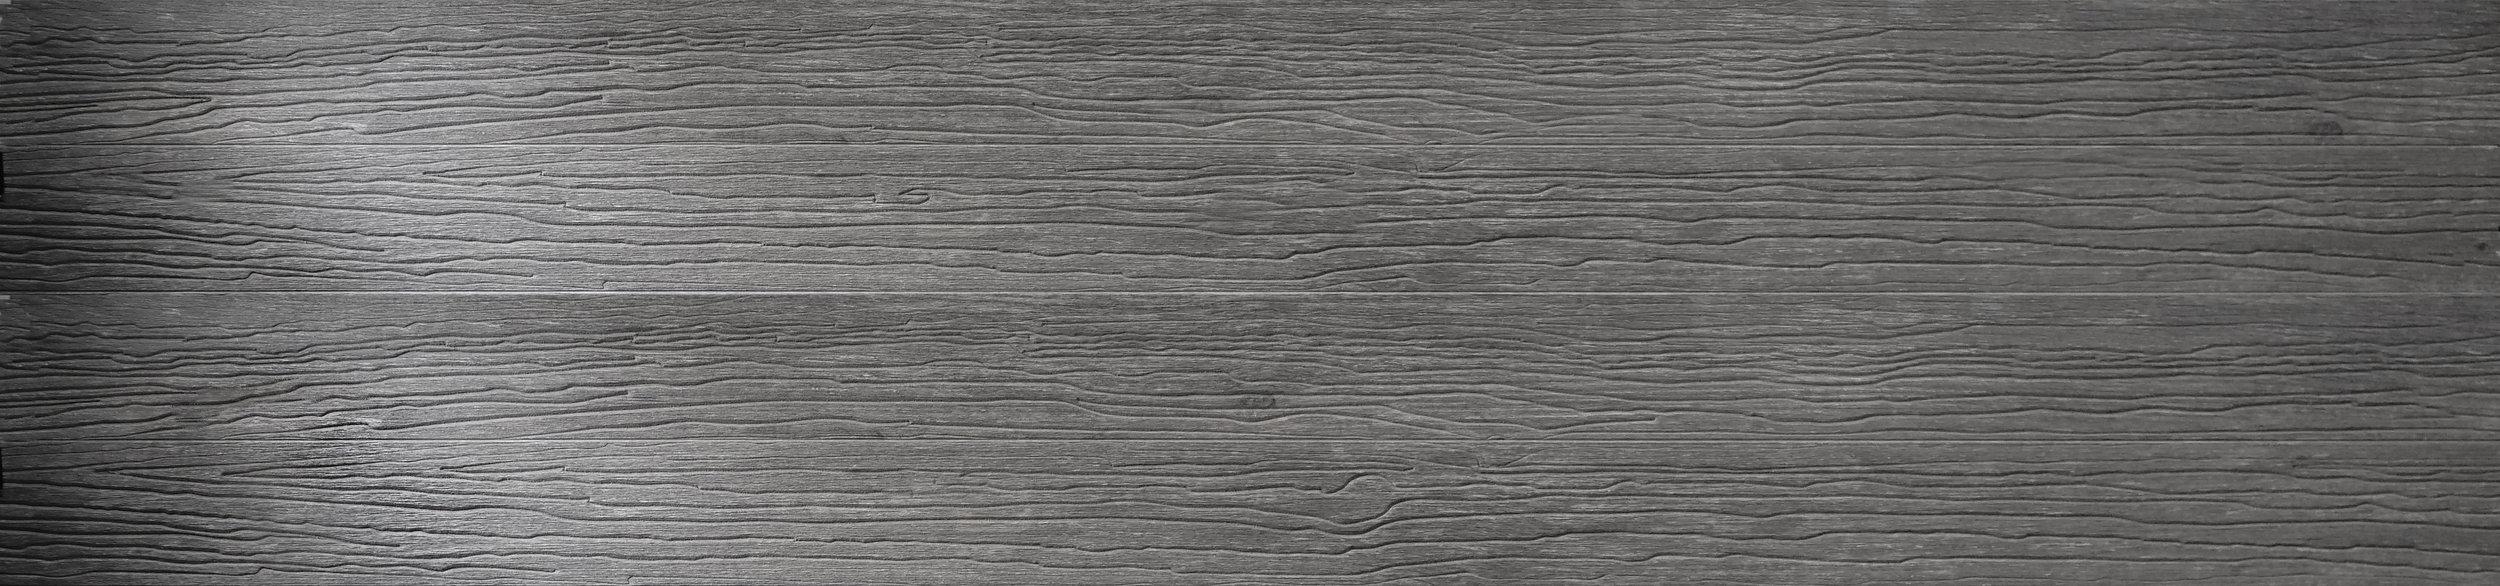 Weathered wood 4 pieces.jpg